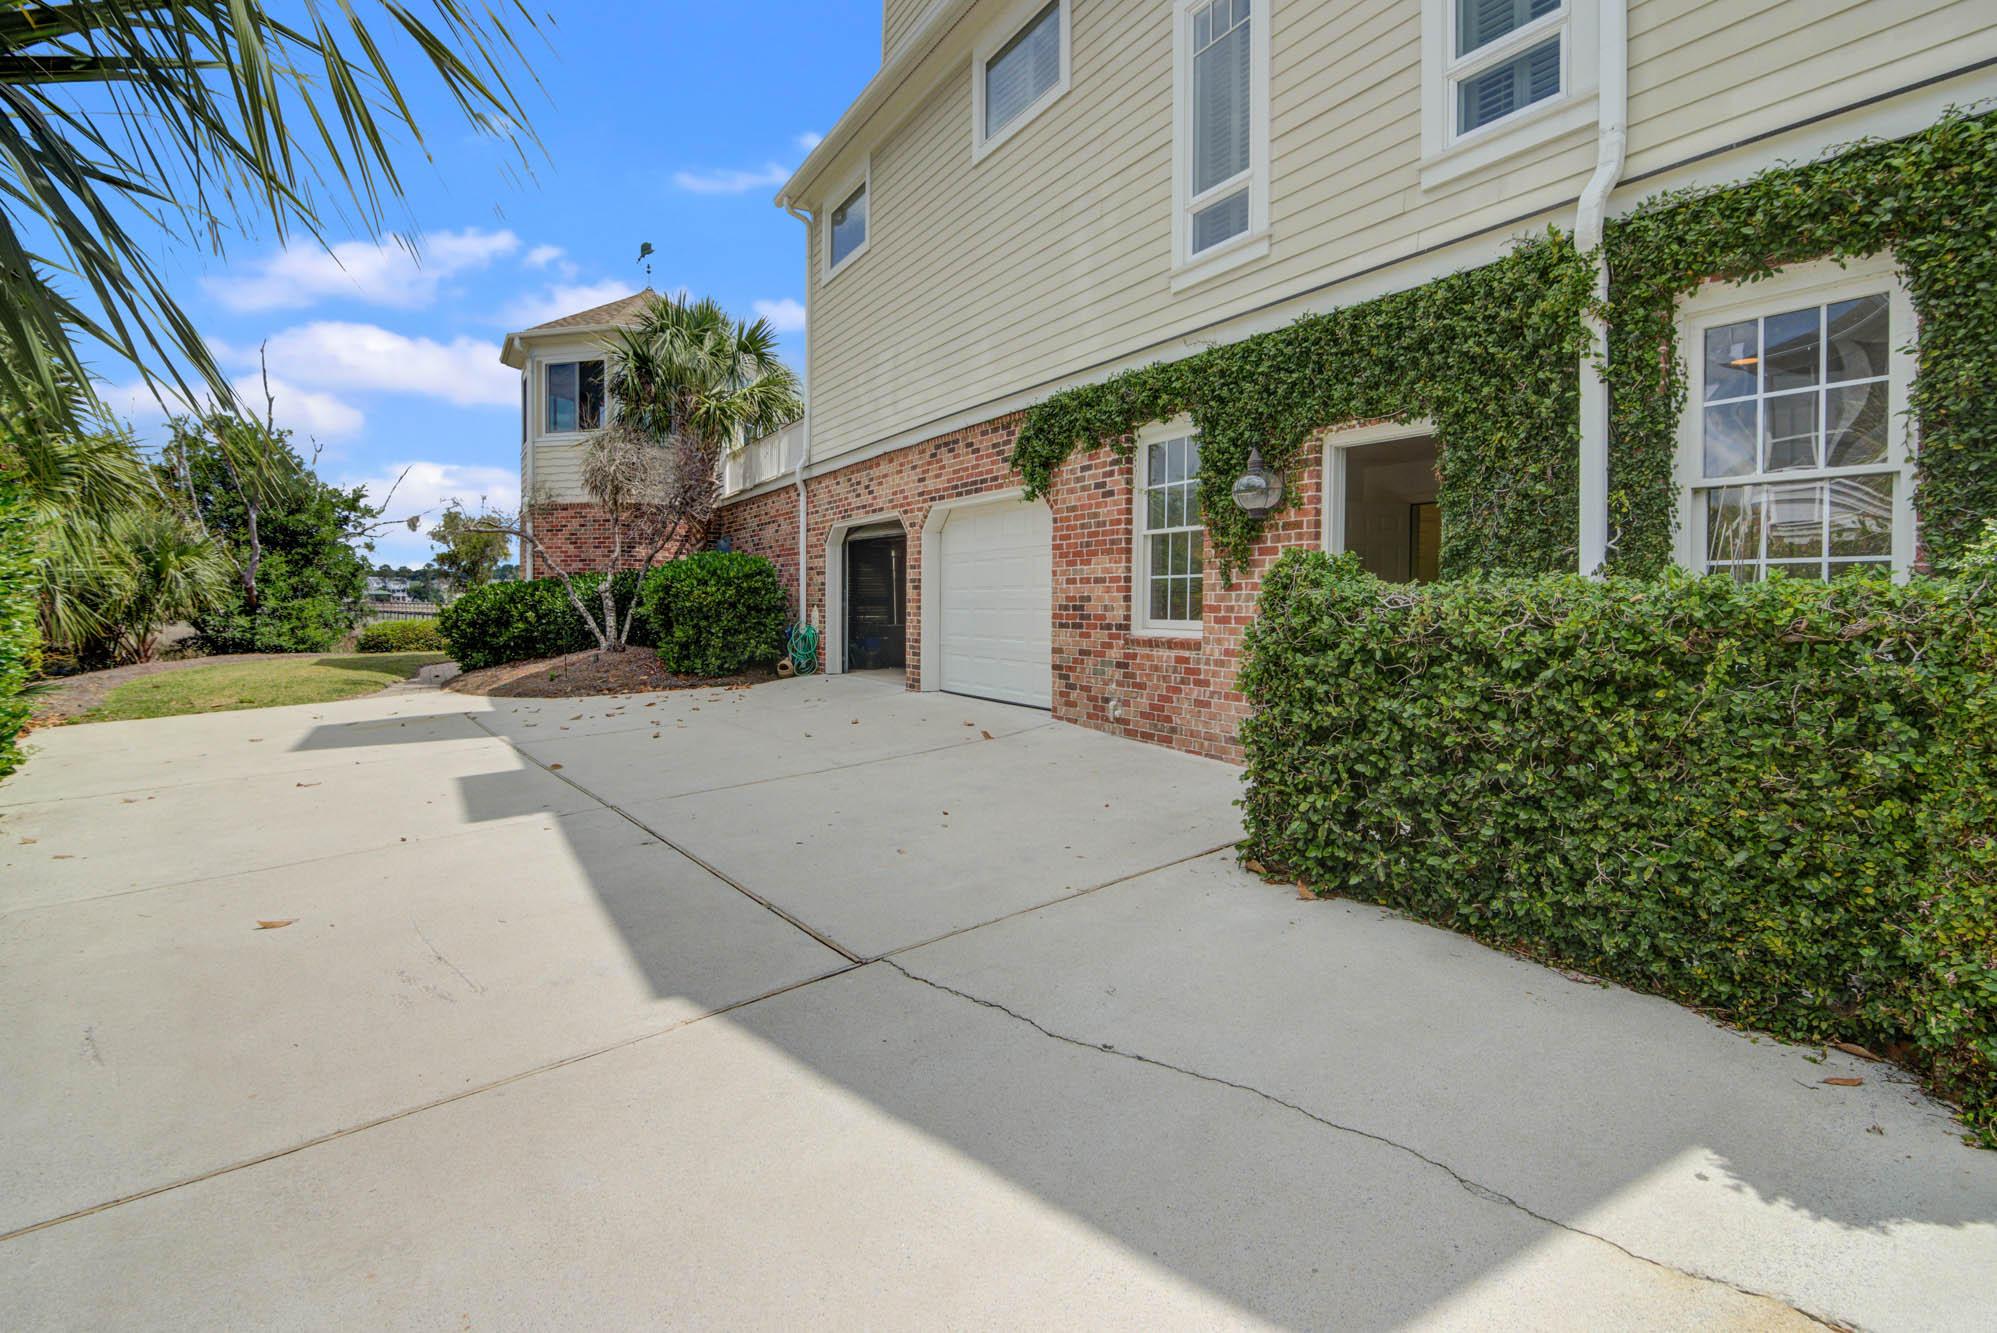 Brickyard Plantation Homes For Sale - 2682 Egrets Landing, Mount Pleasant, SC - 84